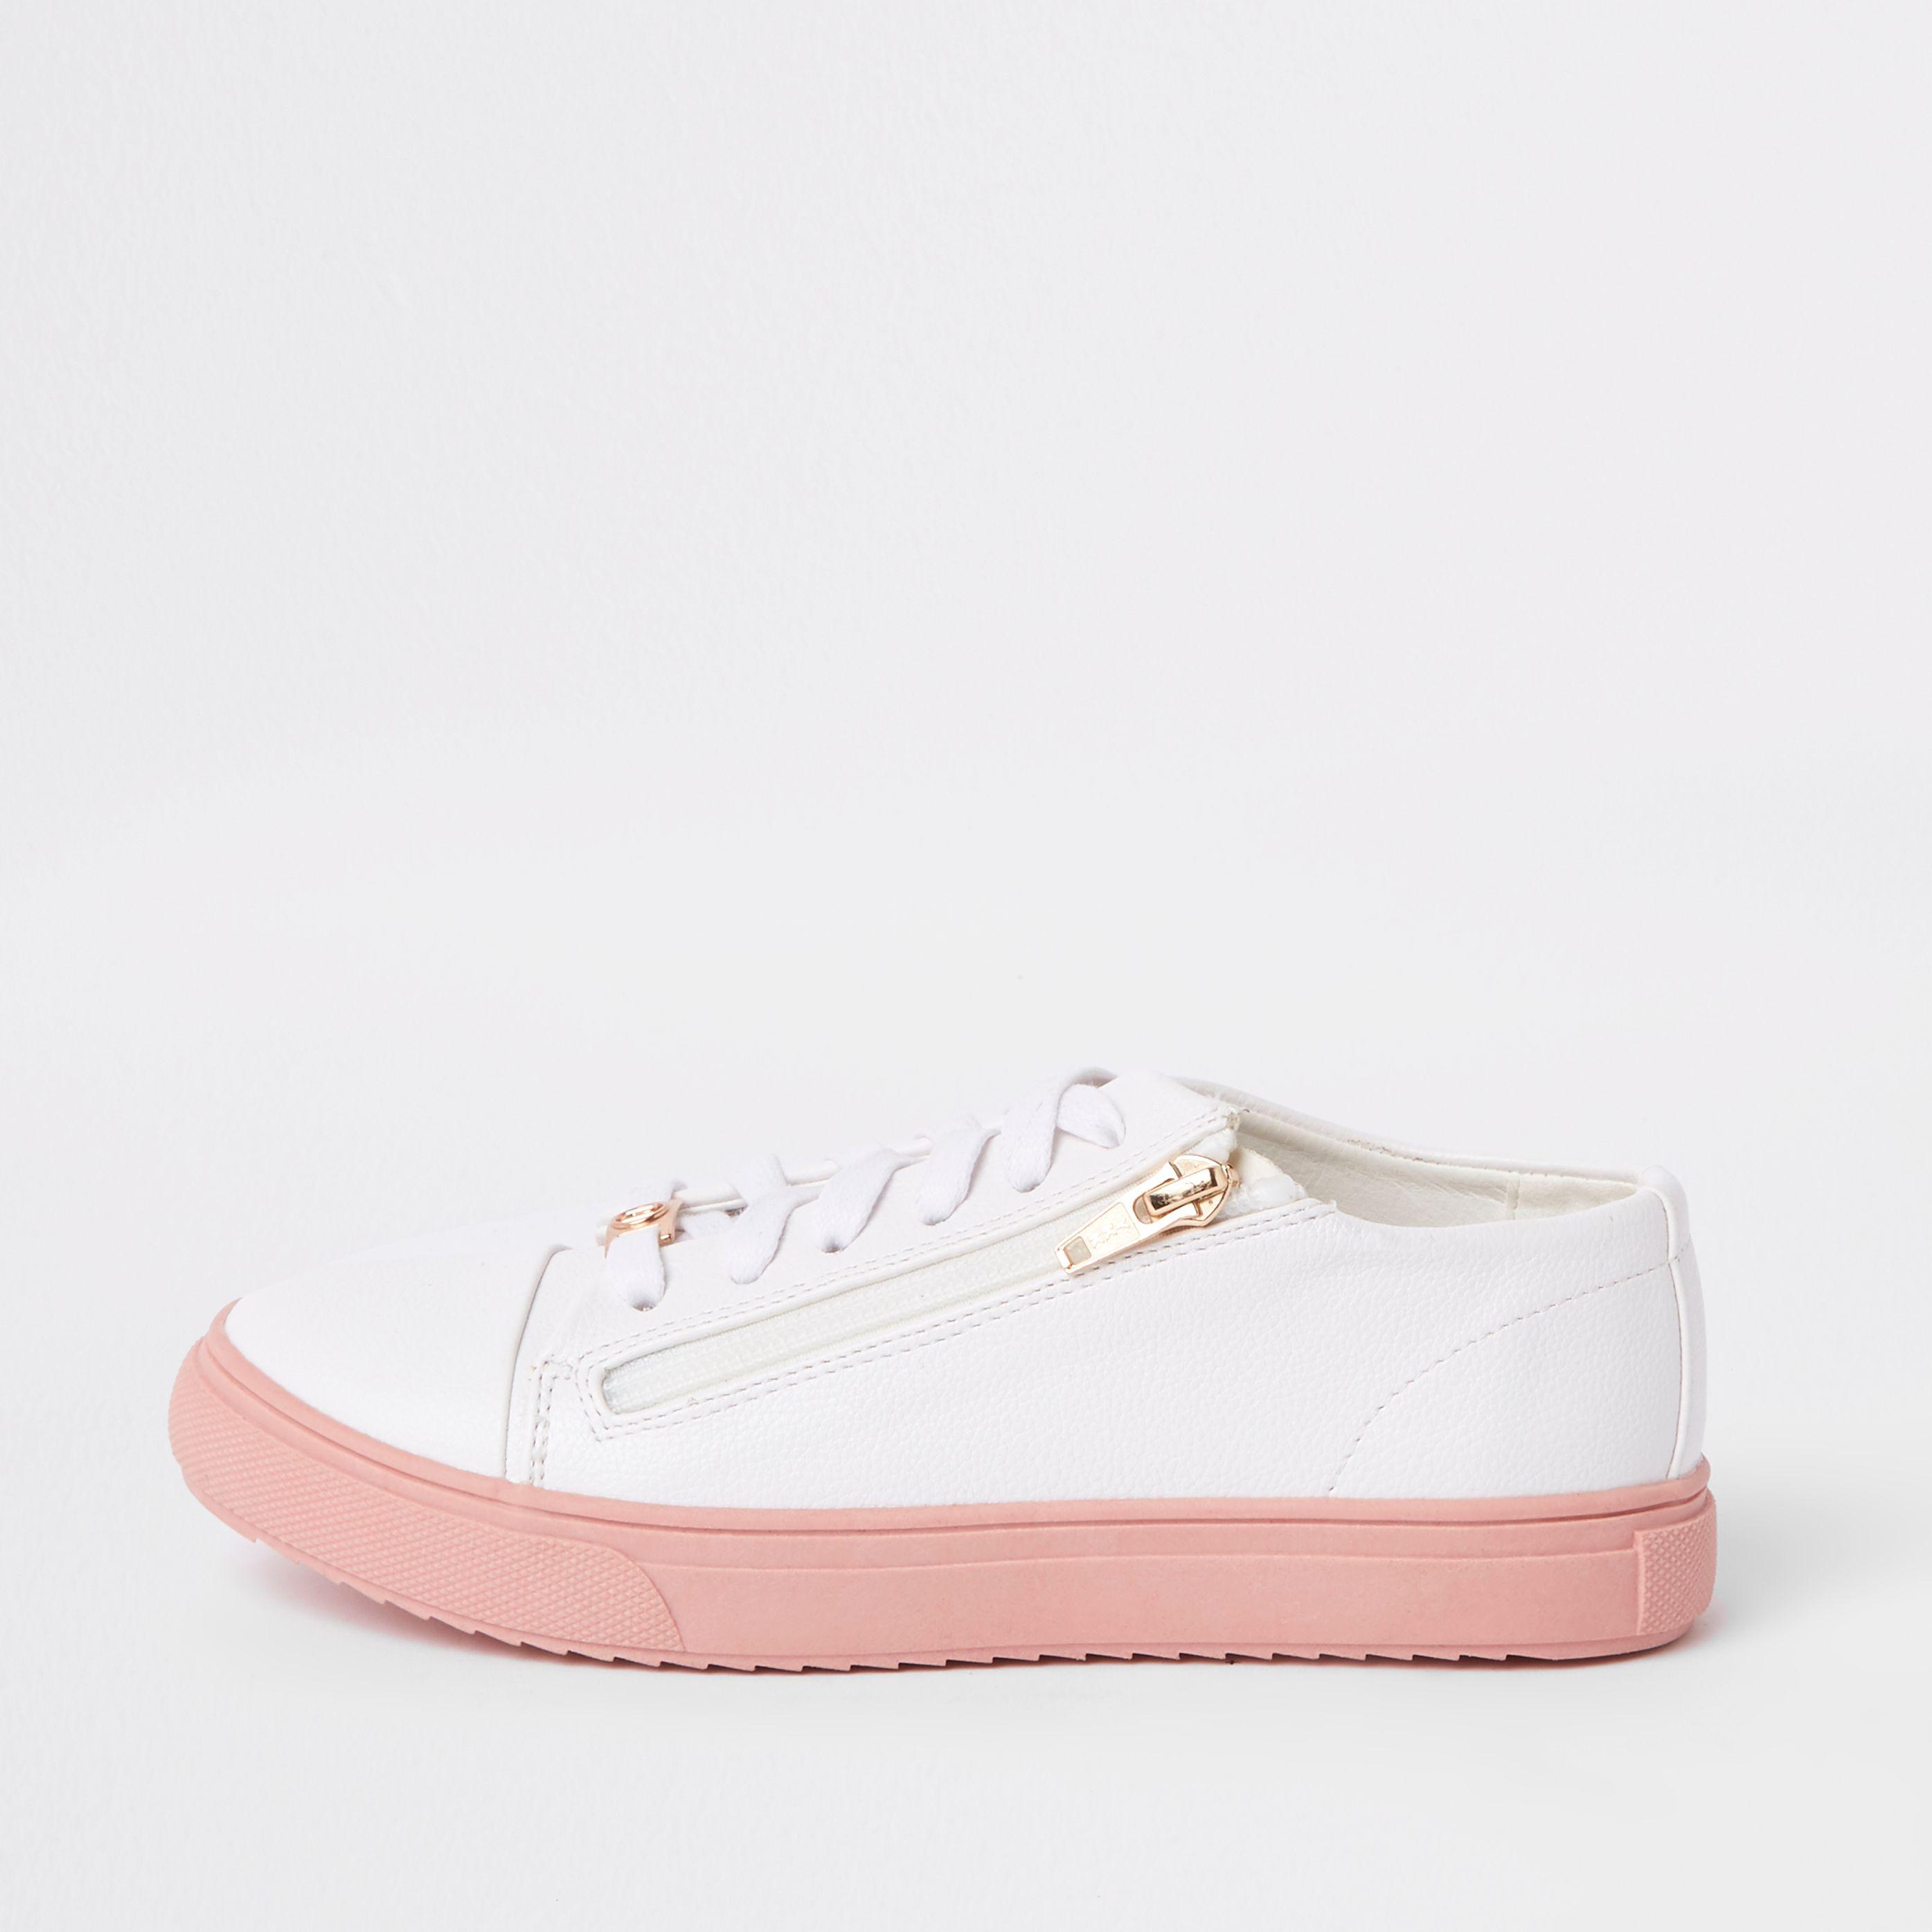 plimsolls   Girls shoes